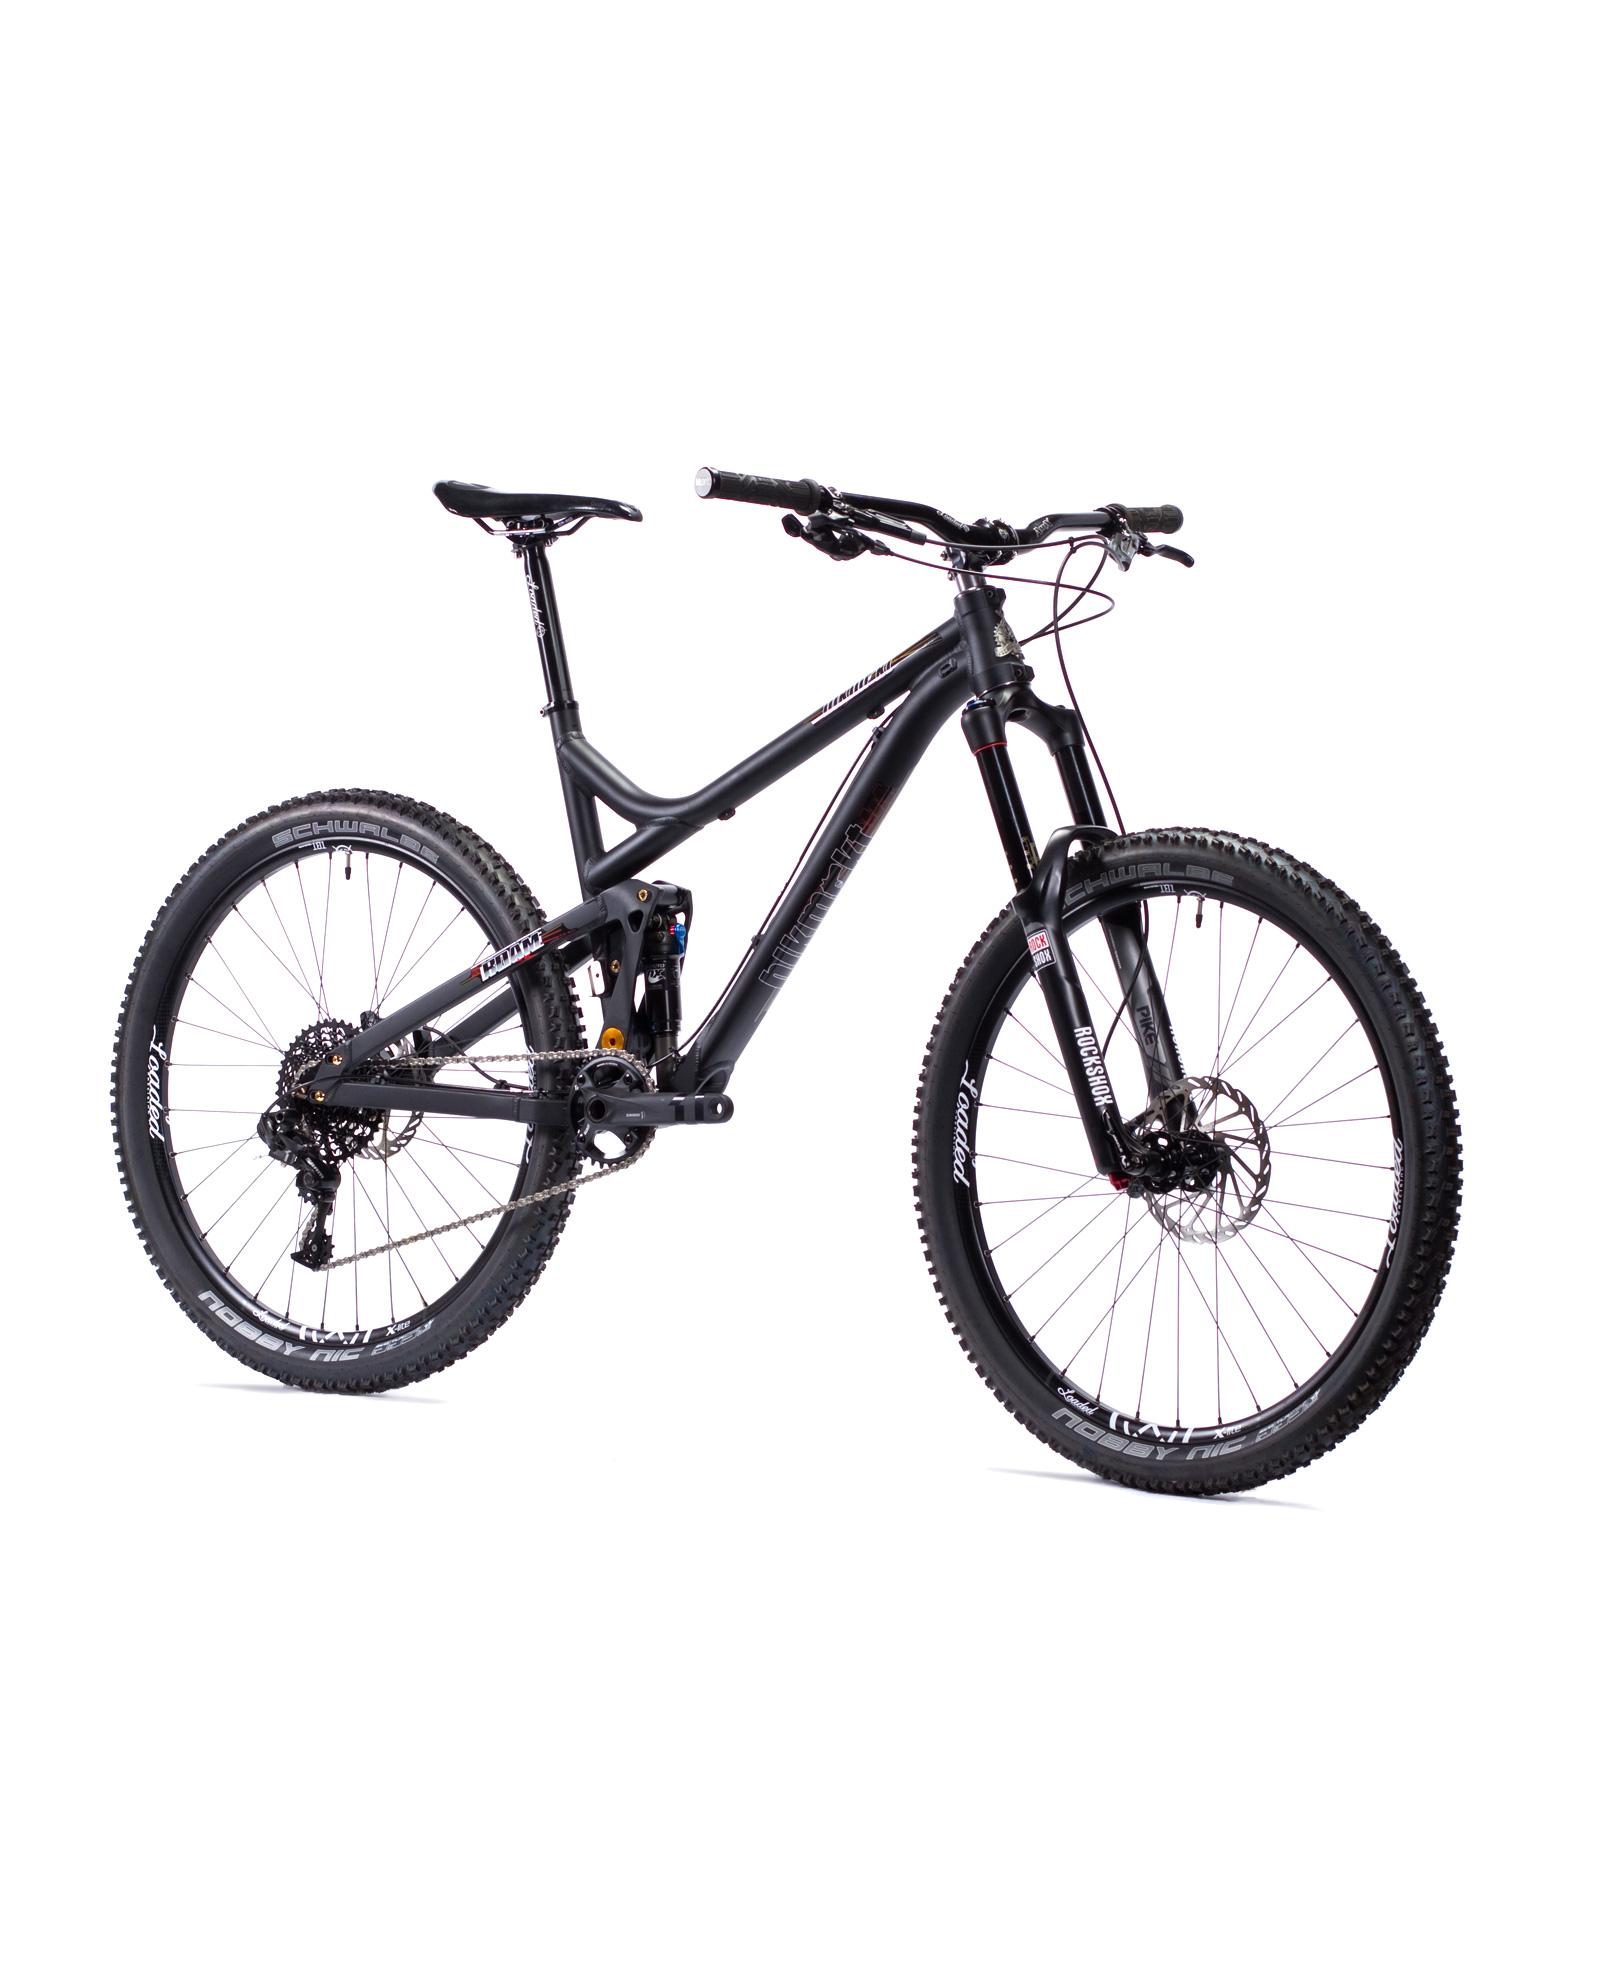 Roam X1 Custom Complete Bike